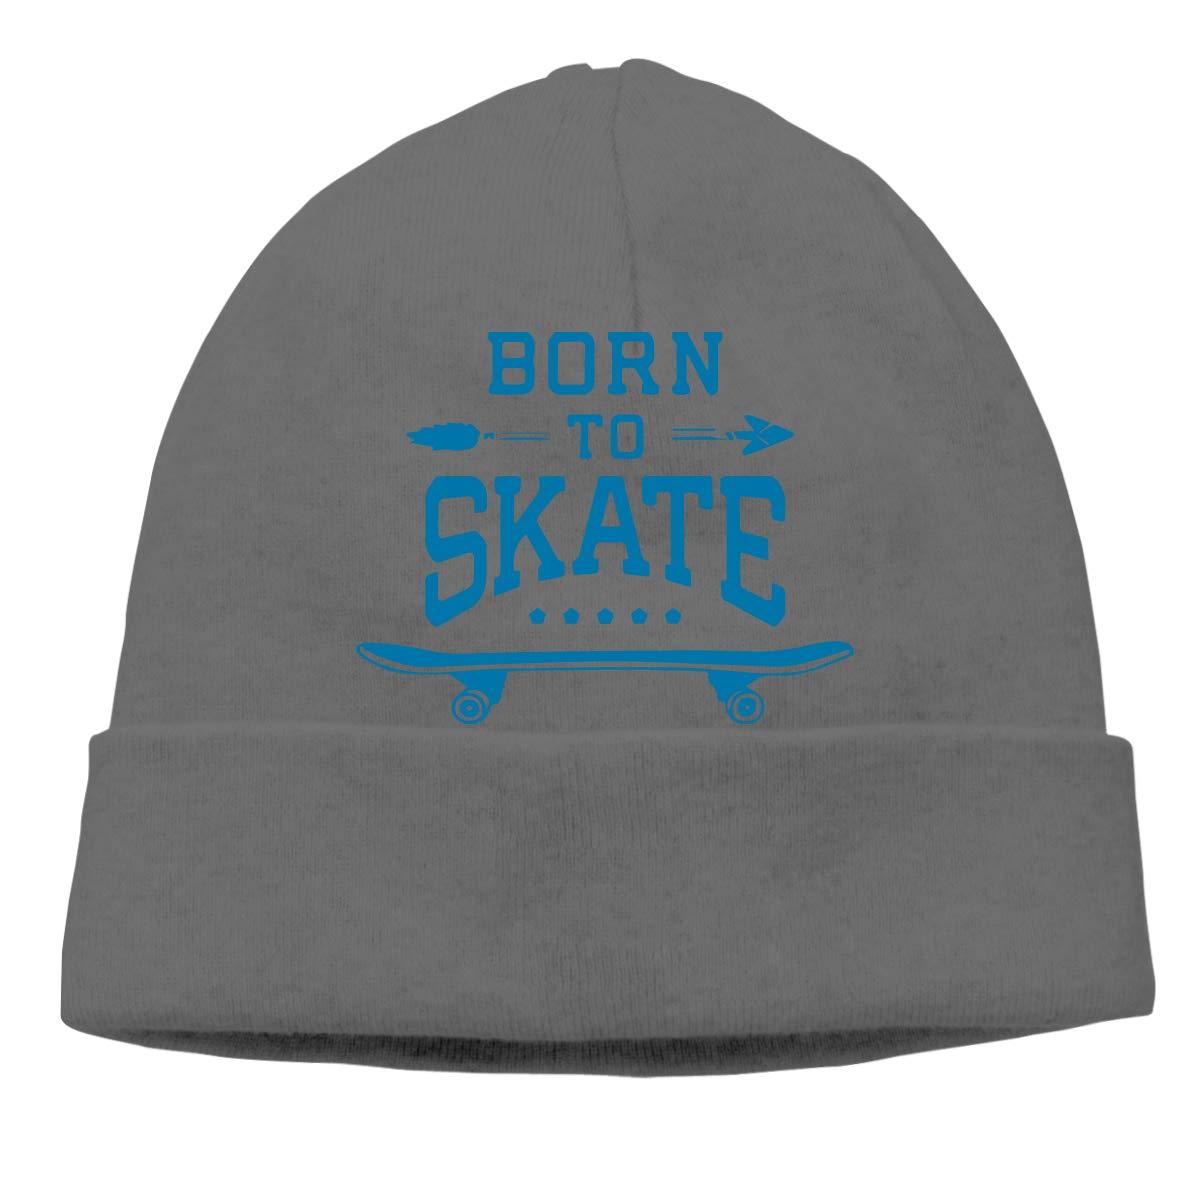 Skateboard Born to Skate Men Women Great Thermal Sports Beanie Cap